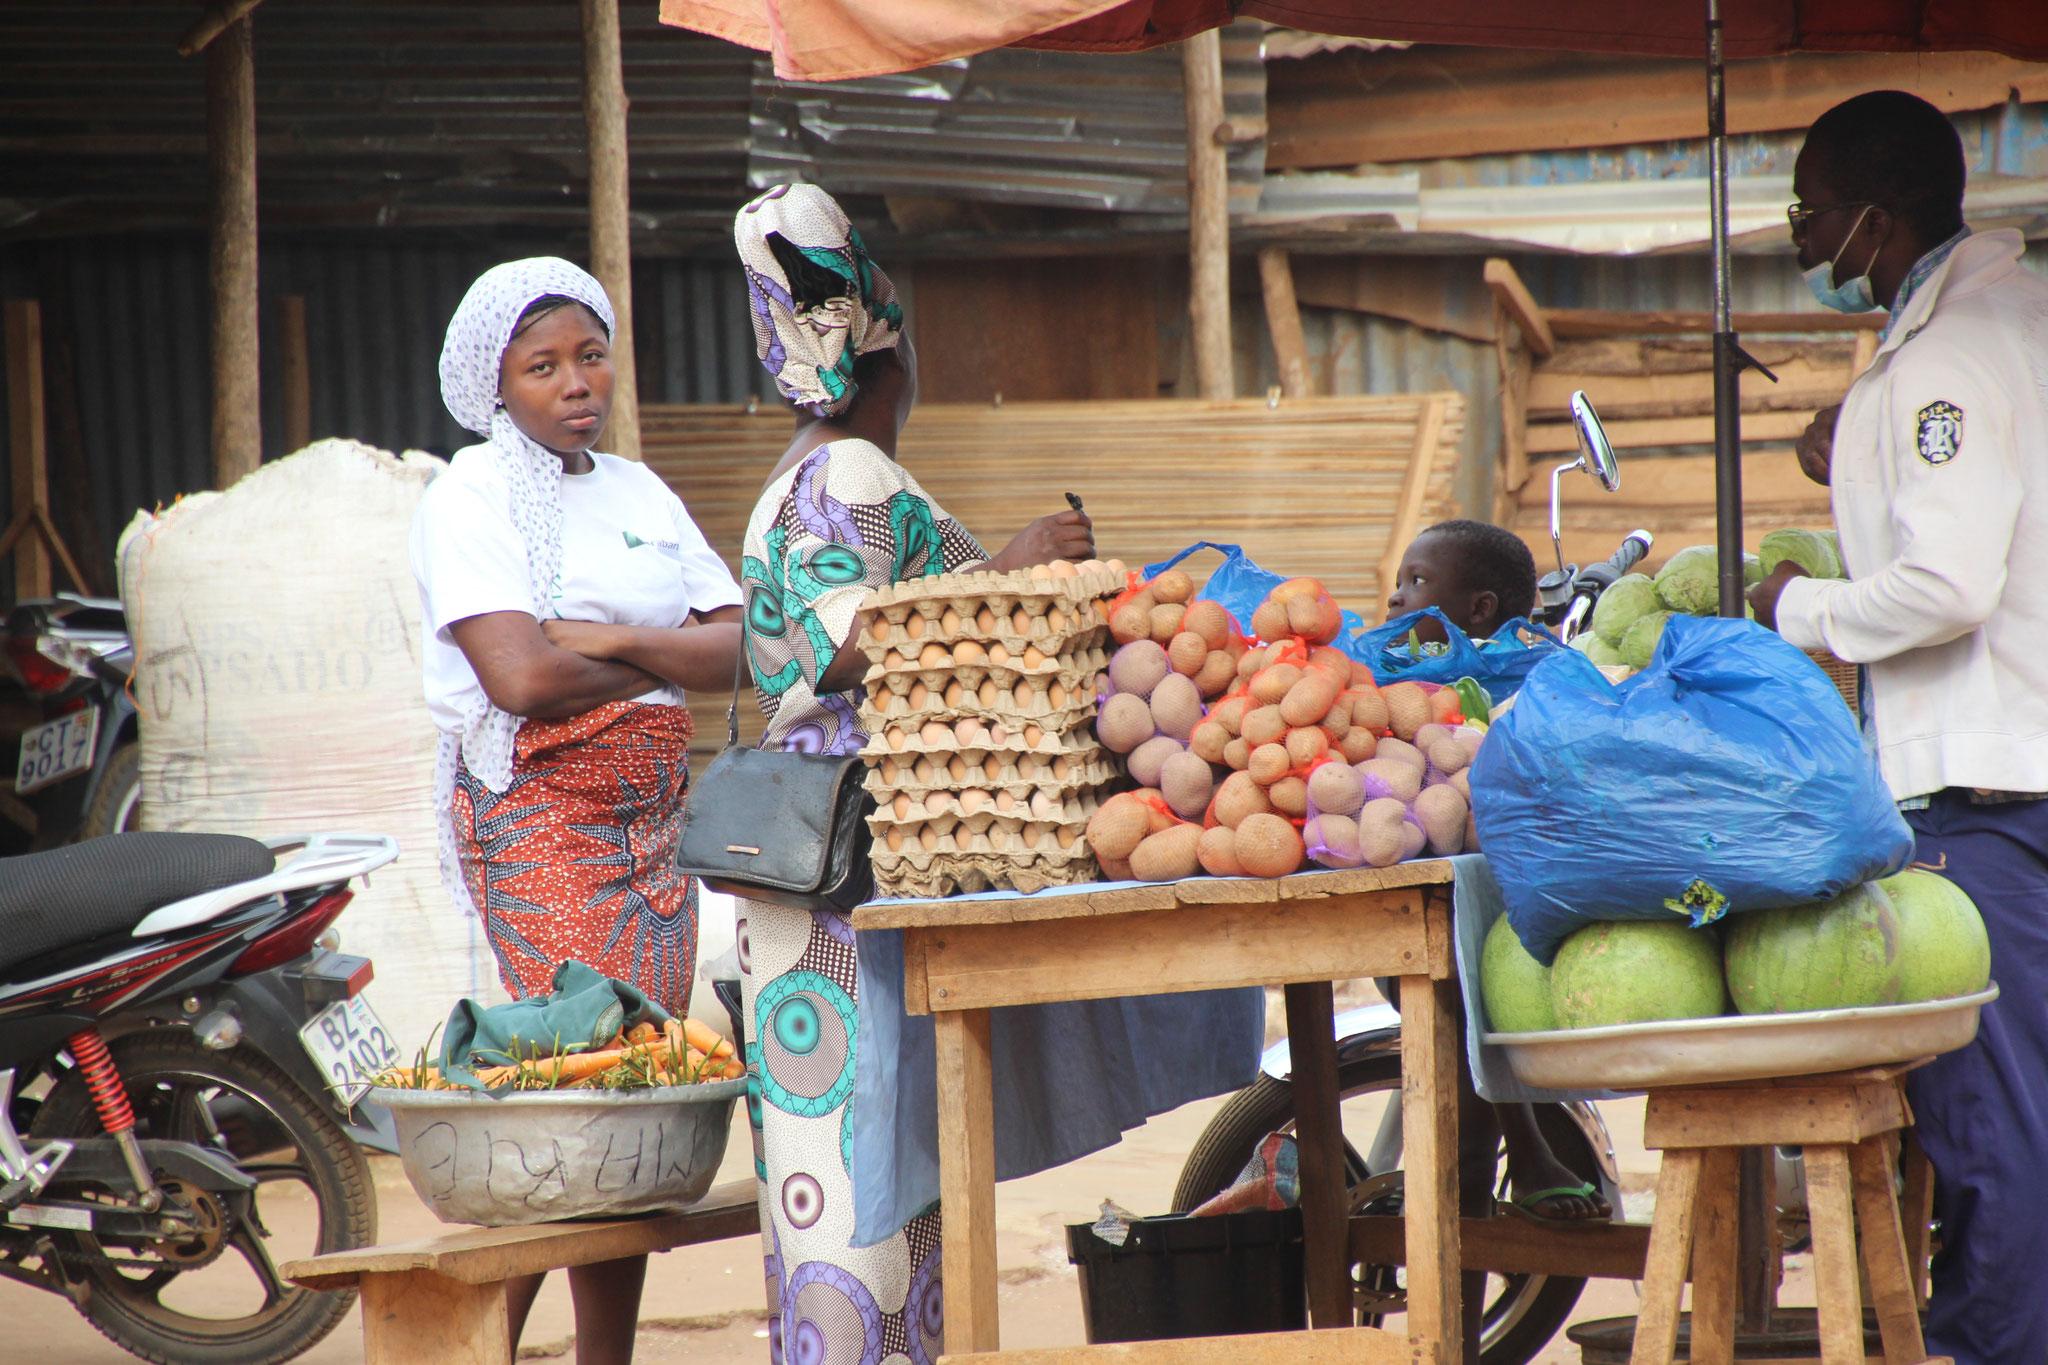 Marktfrau.